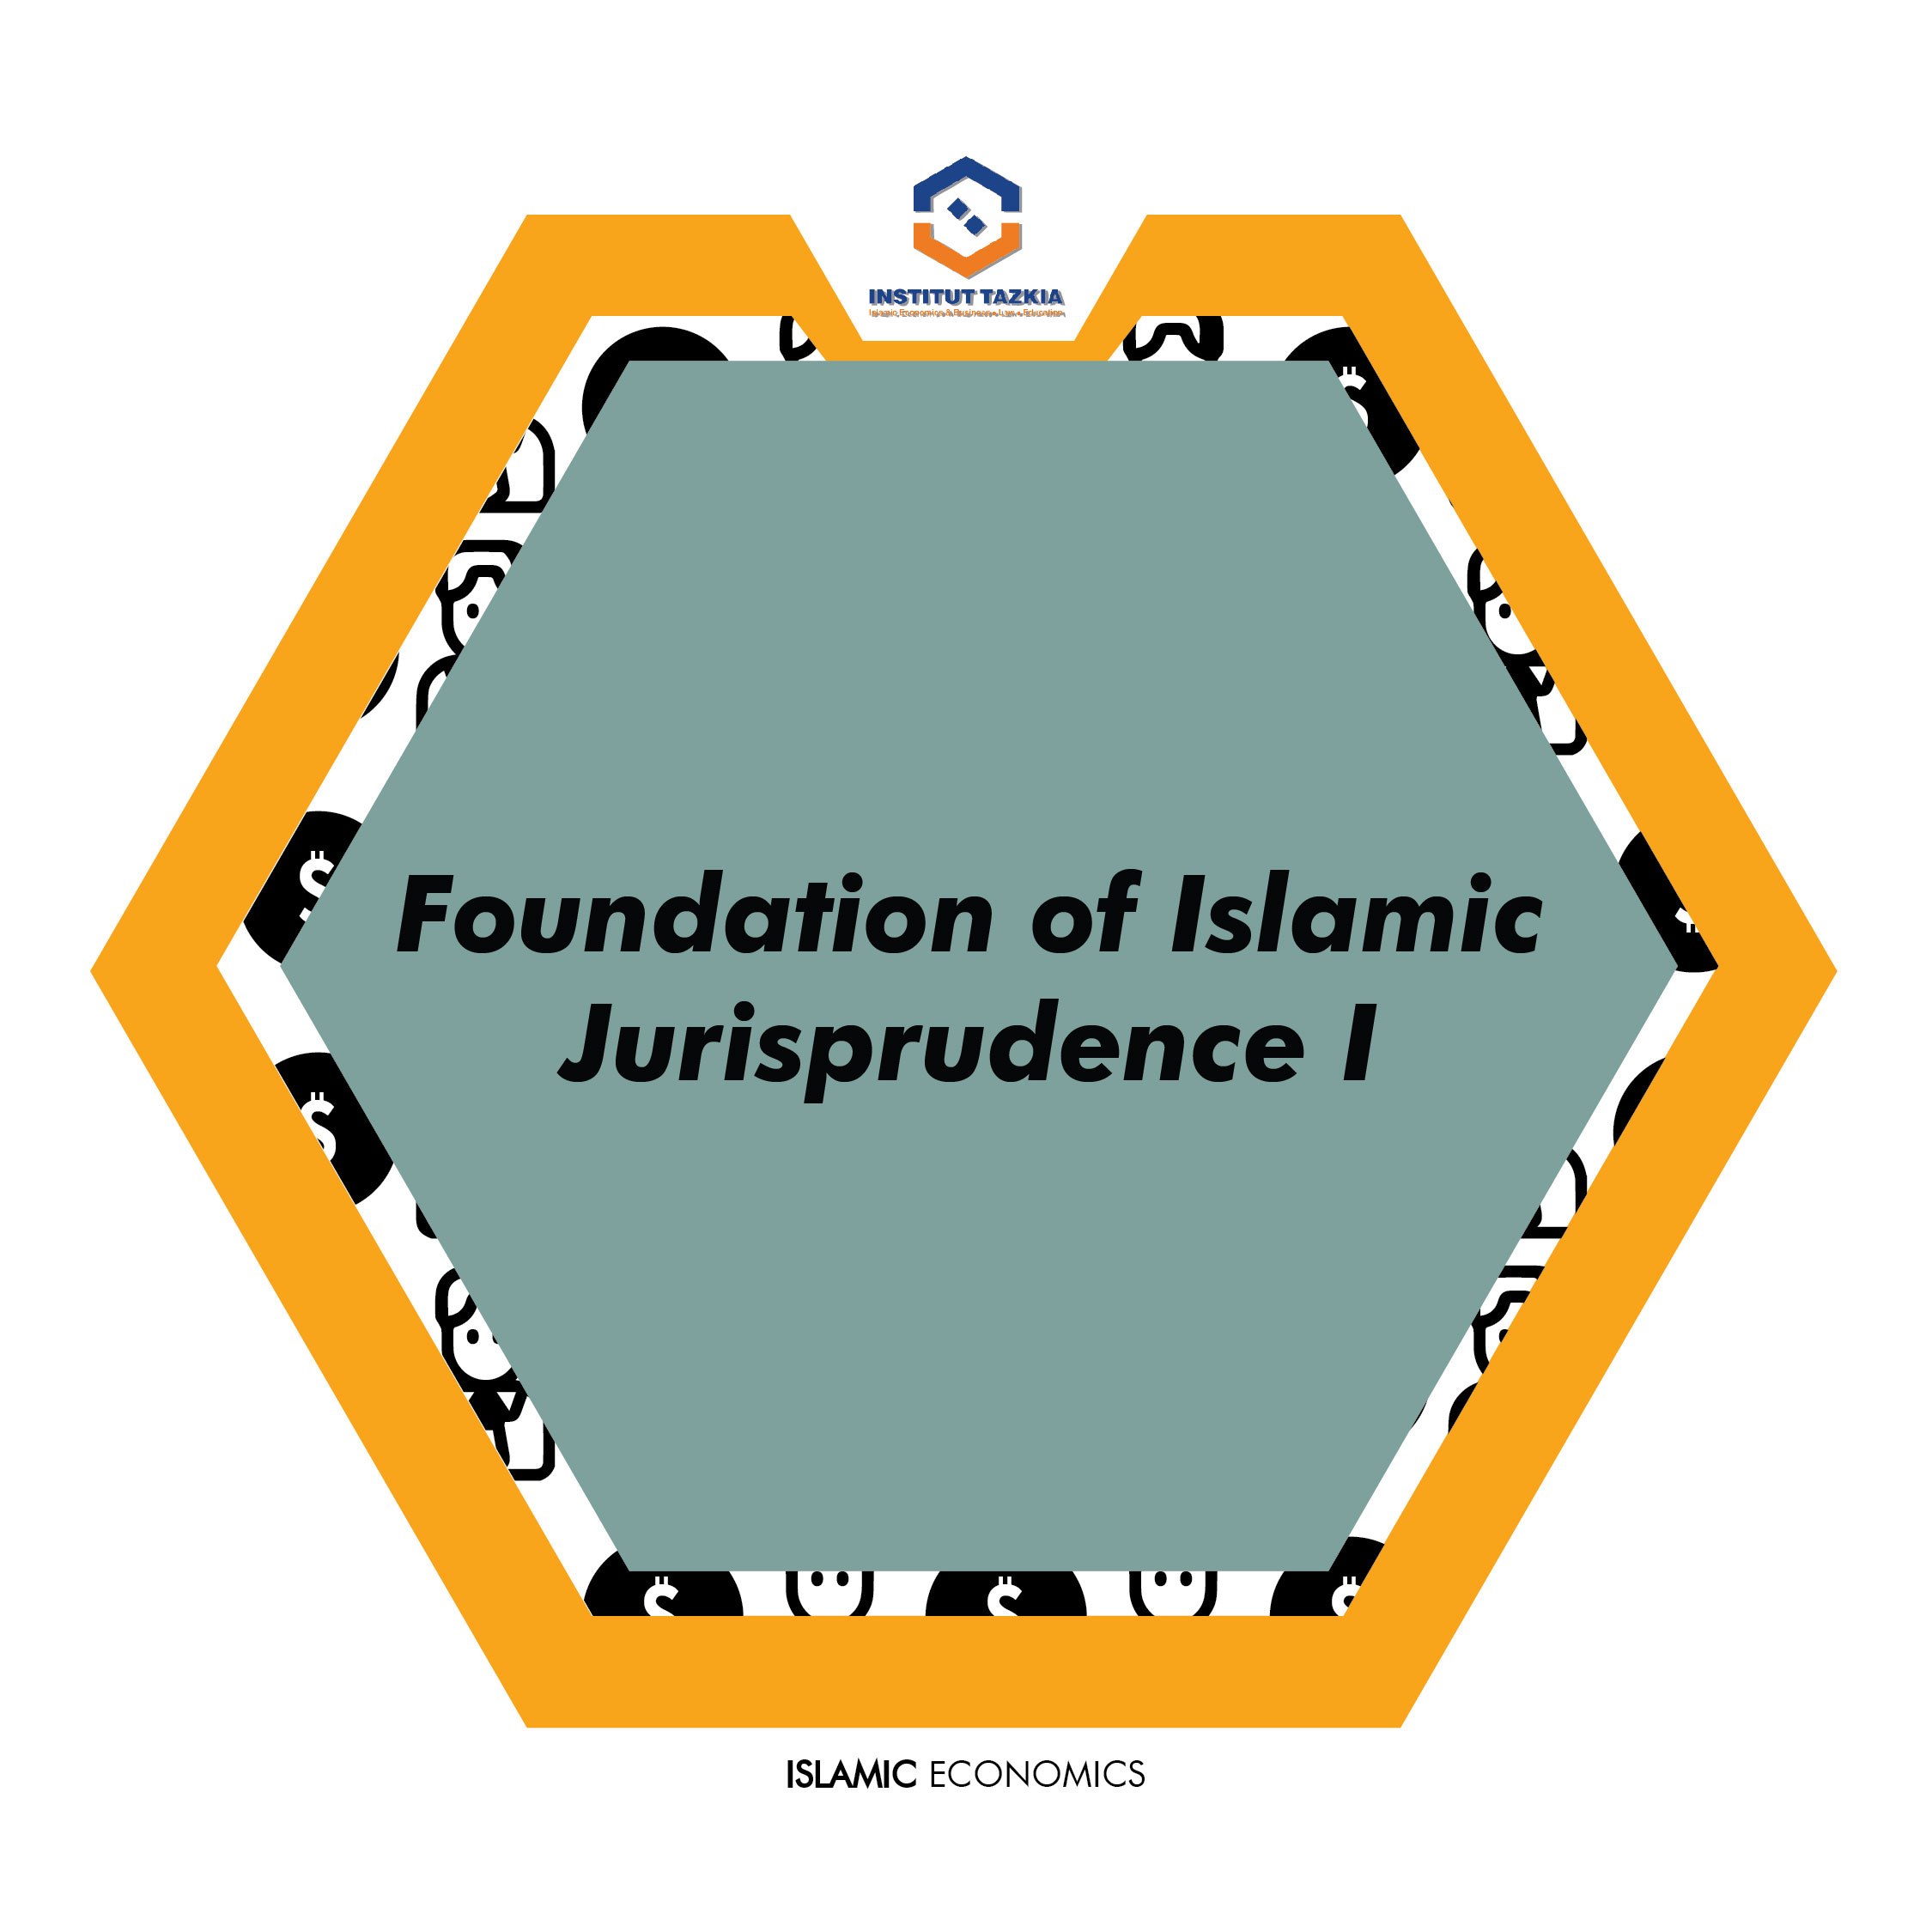 20201 Foundation of Islamic Jurisprudence I ESy-19-A